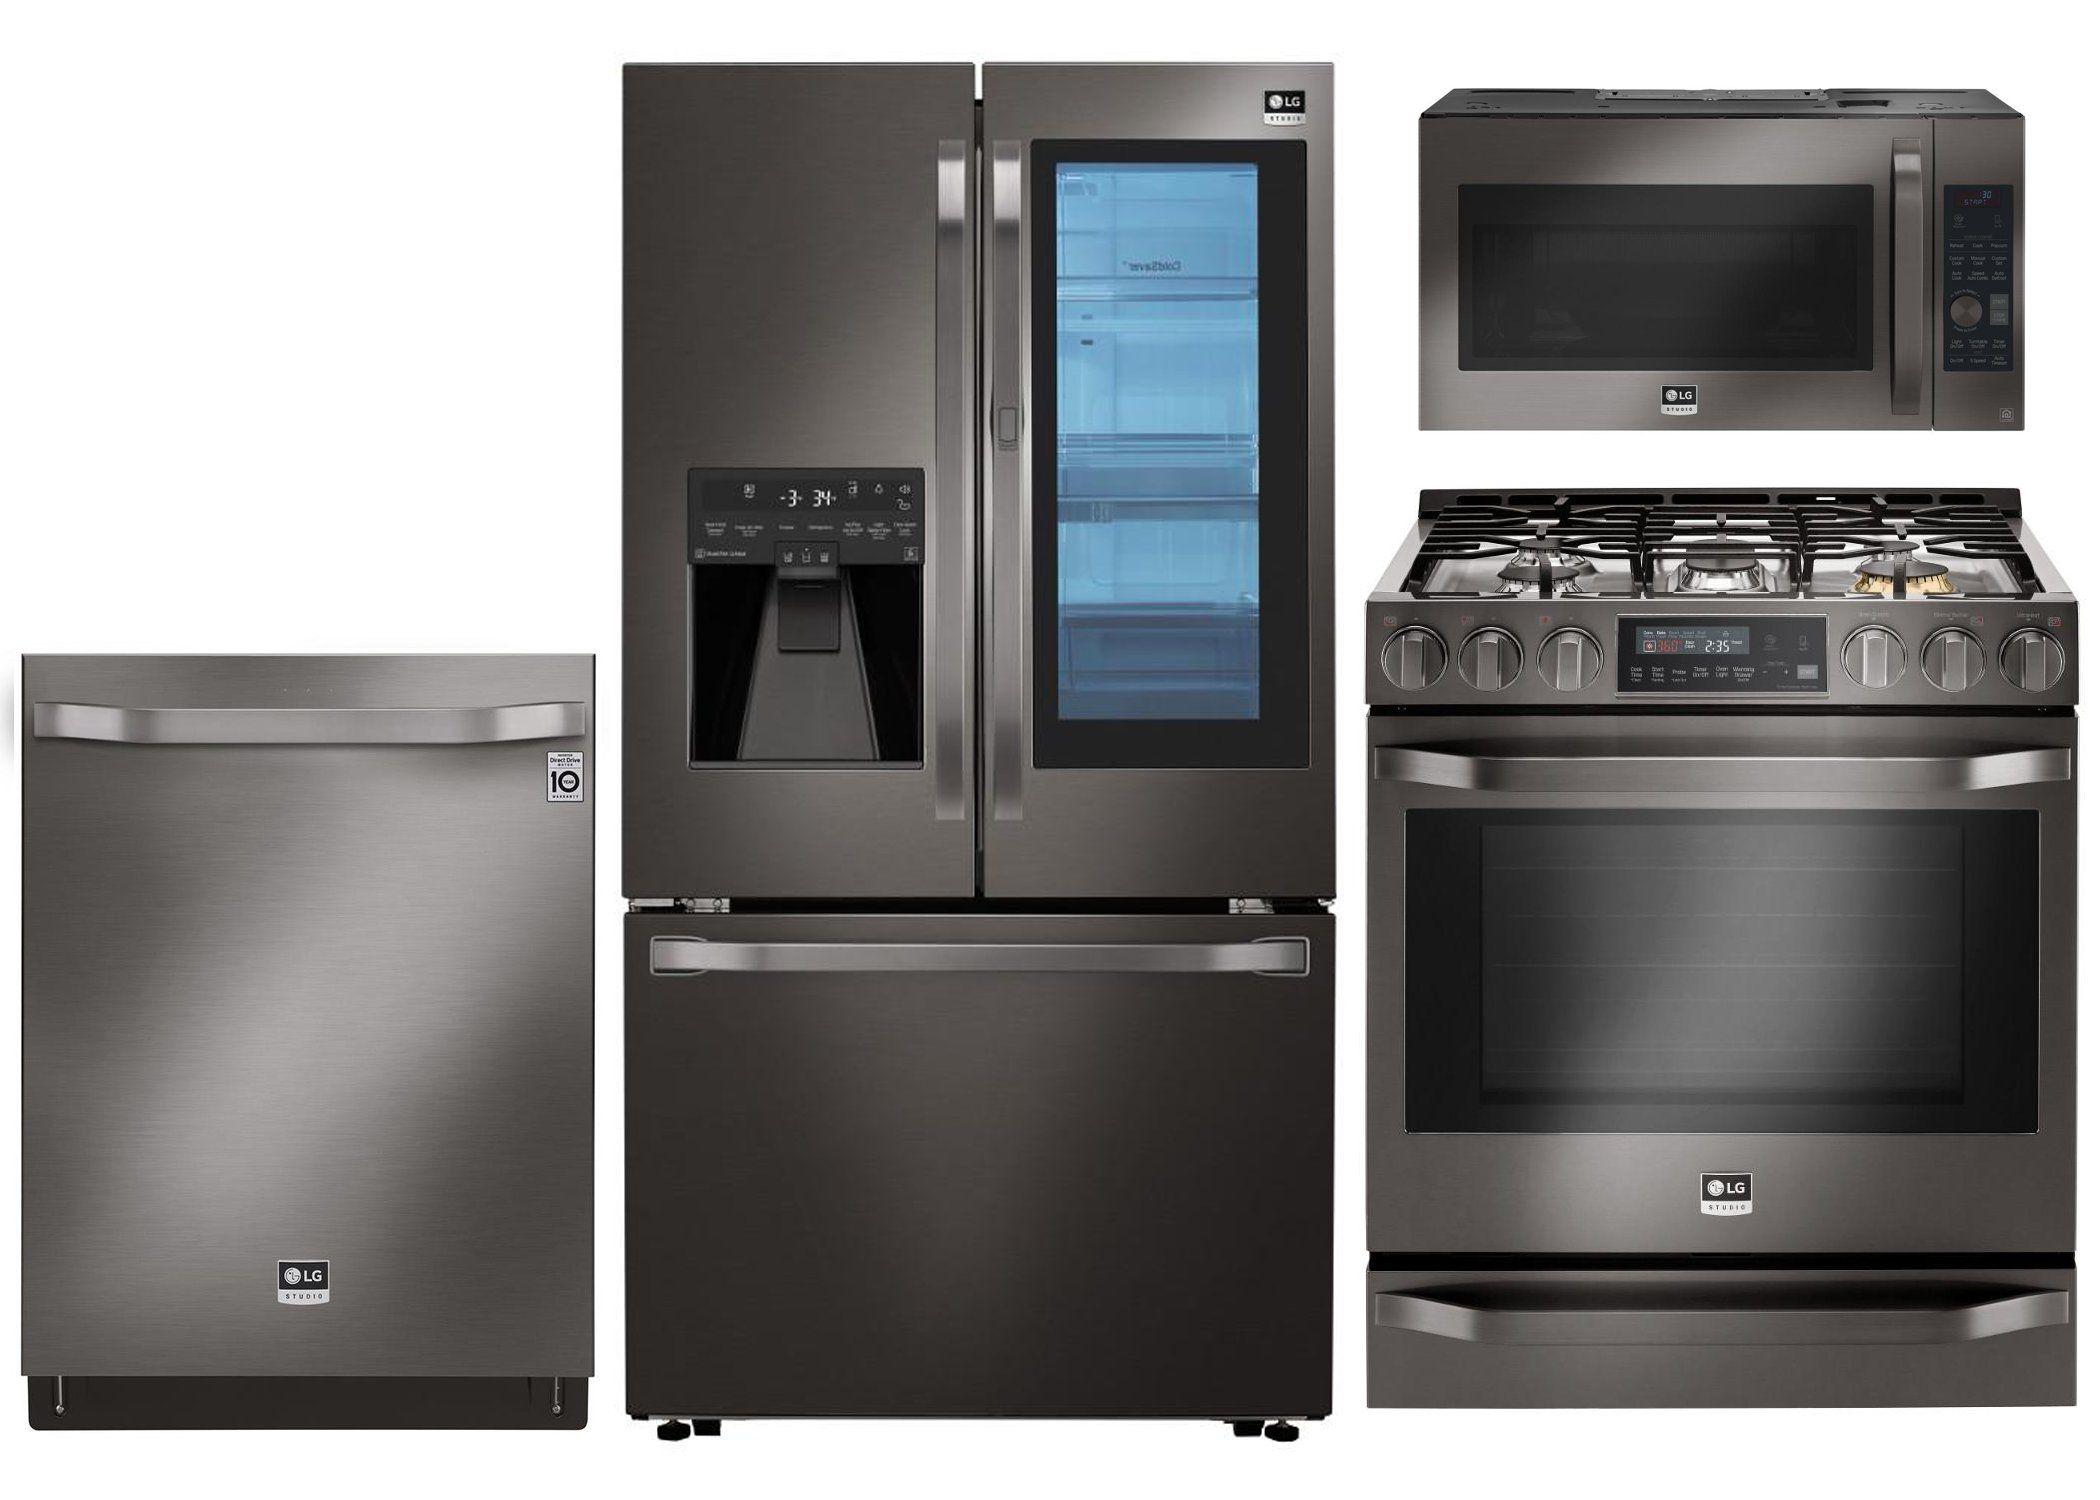 Lg Studio 4 Piece Kitchen Appliance Package With Gas Range Black Stainless Steel Kitchen Appliance Packages Kitchen Appliances Kitchen